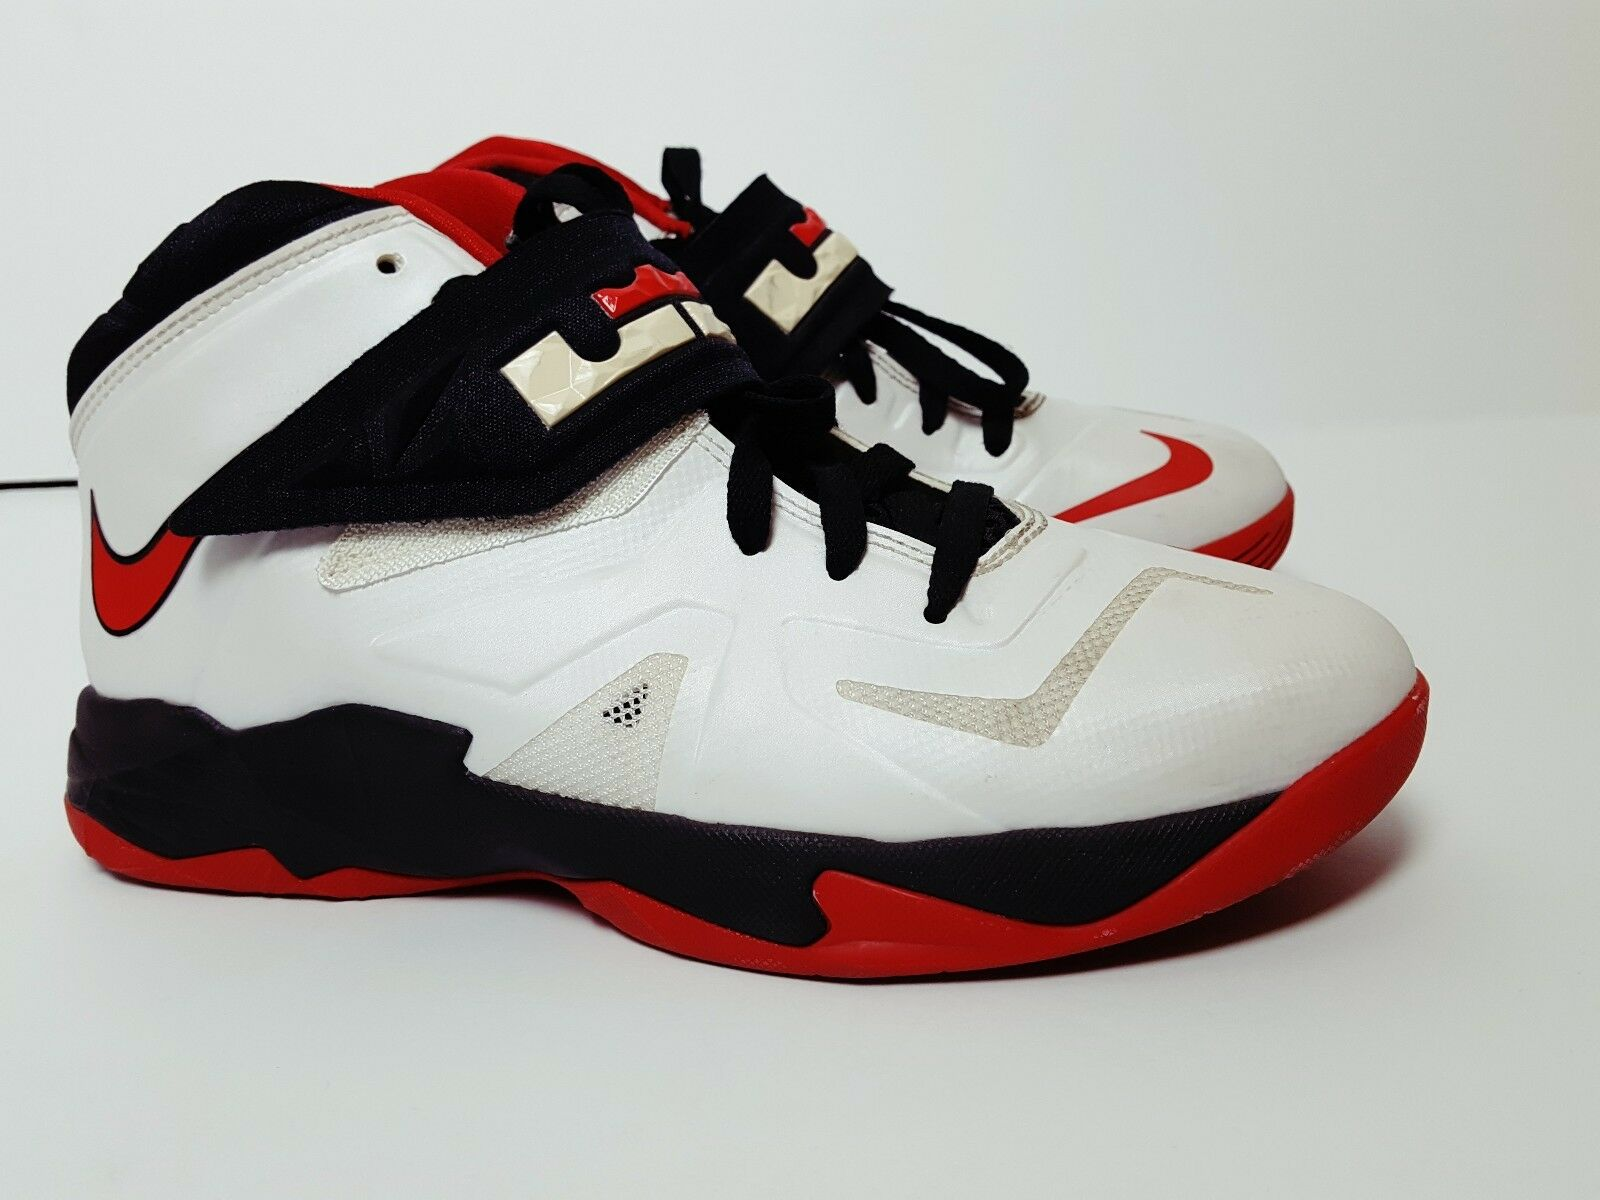 Nike Zoom Lebron Soldier VII 7 MEN'S Sz.7Y Red White Black Basketball 599264-100